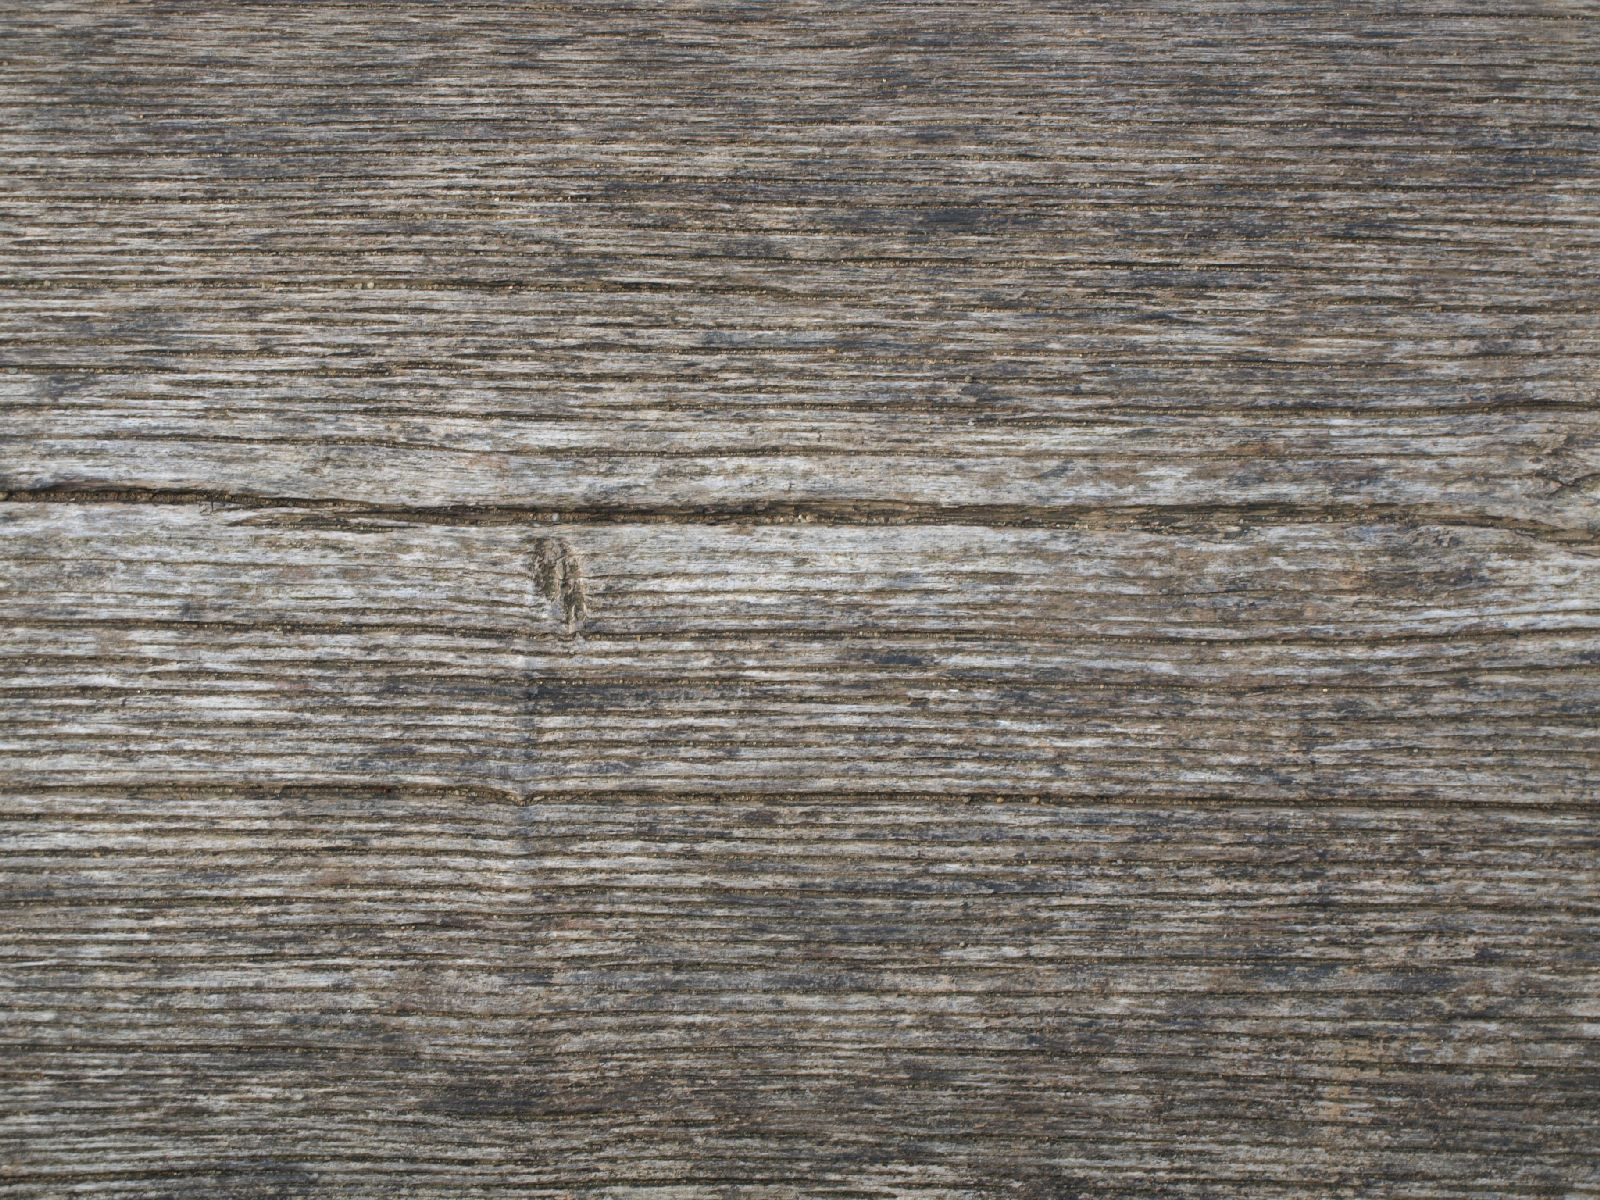 Wood_Texture_A_P8024102